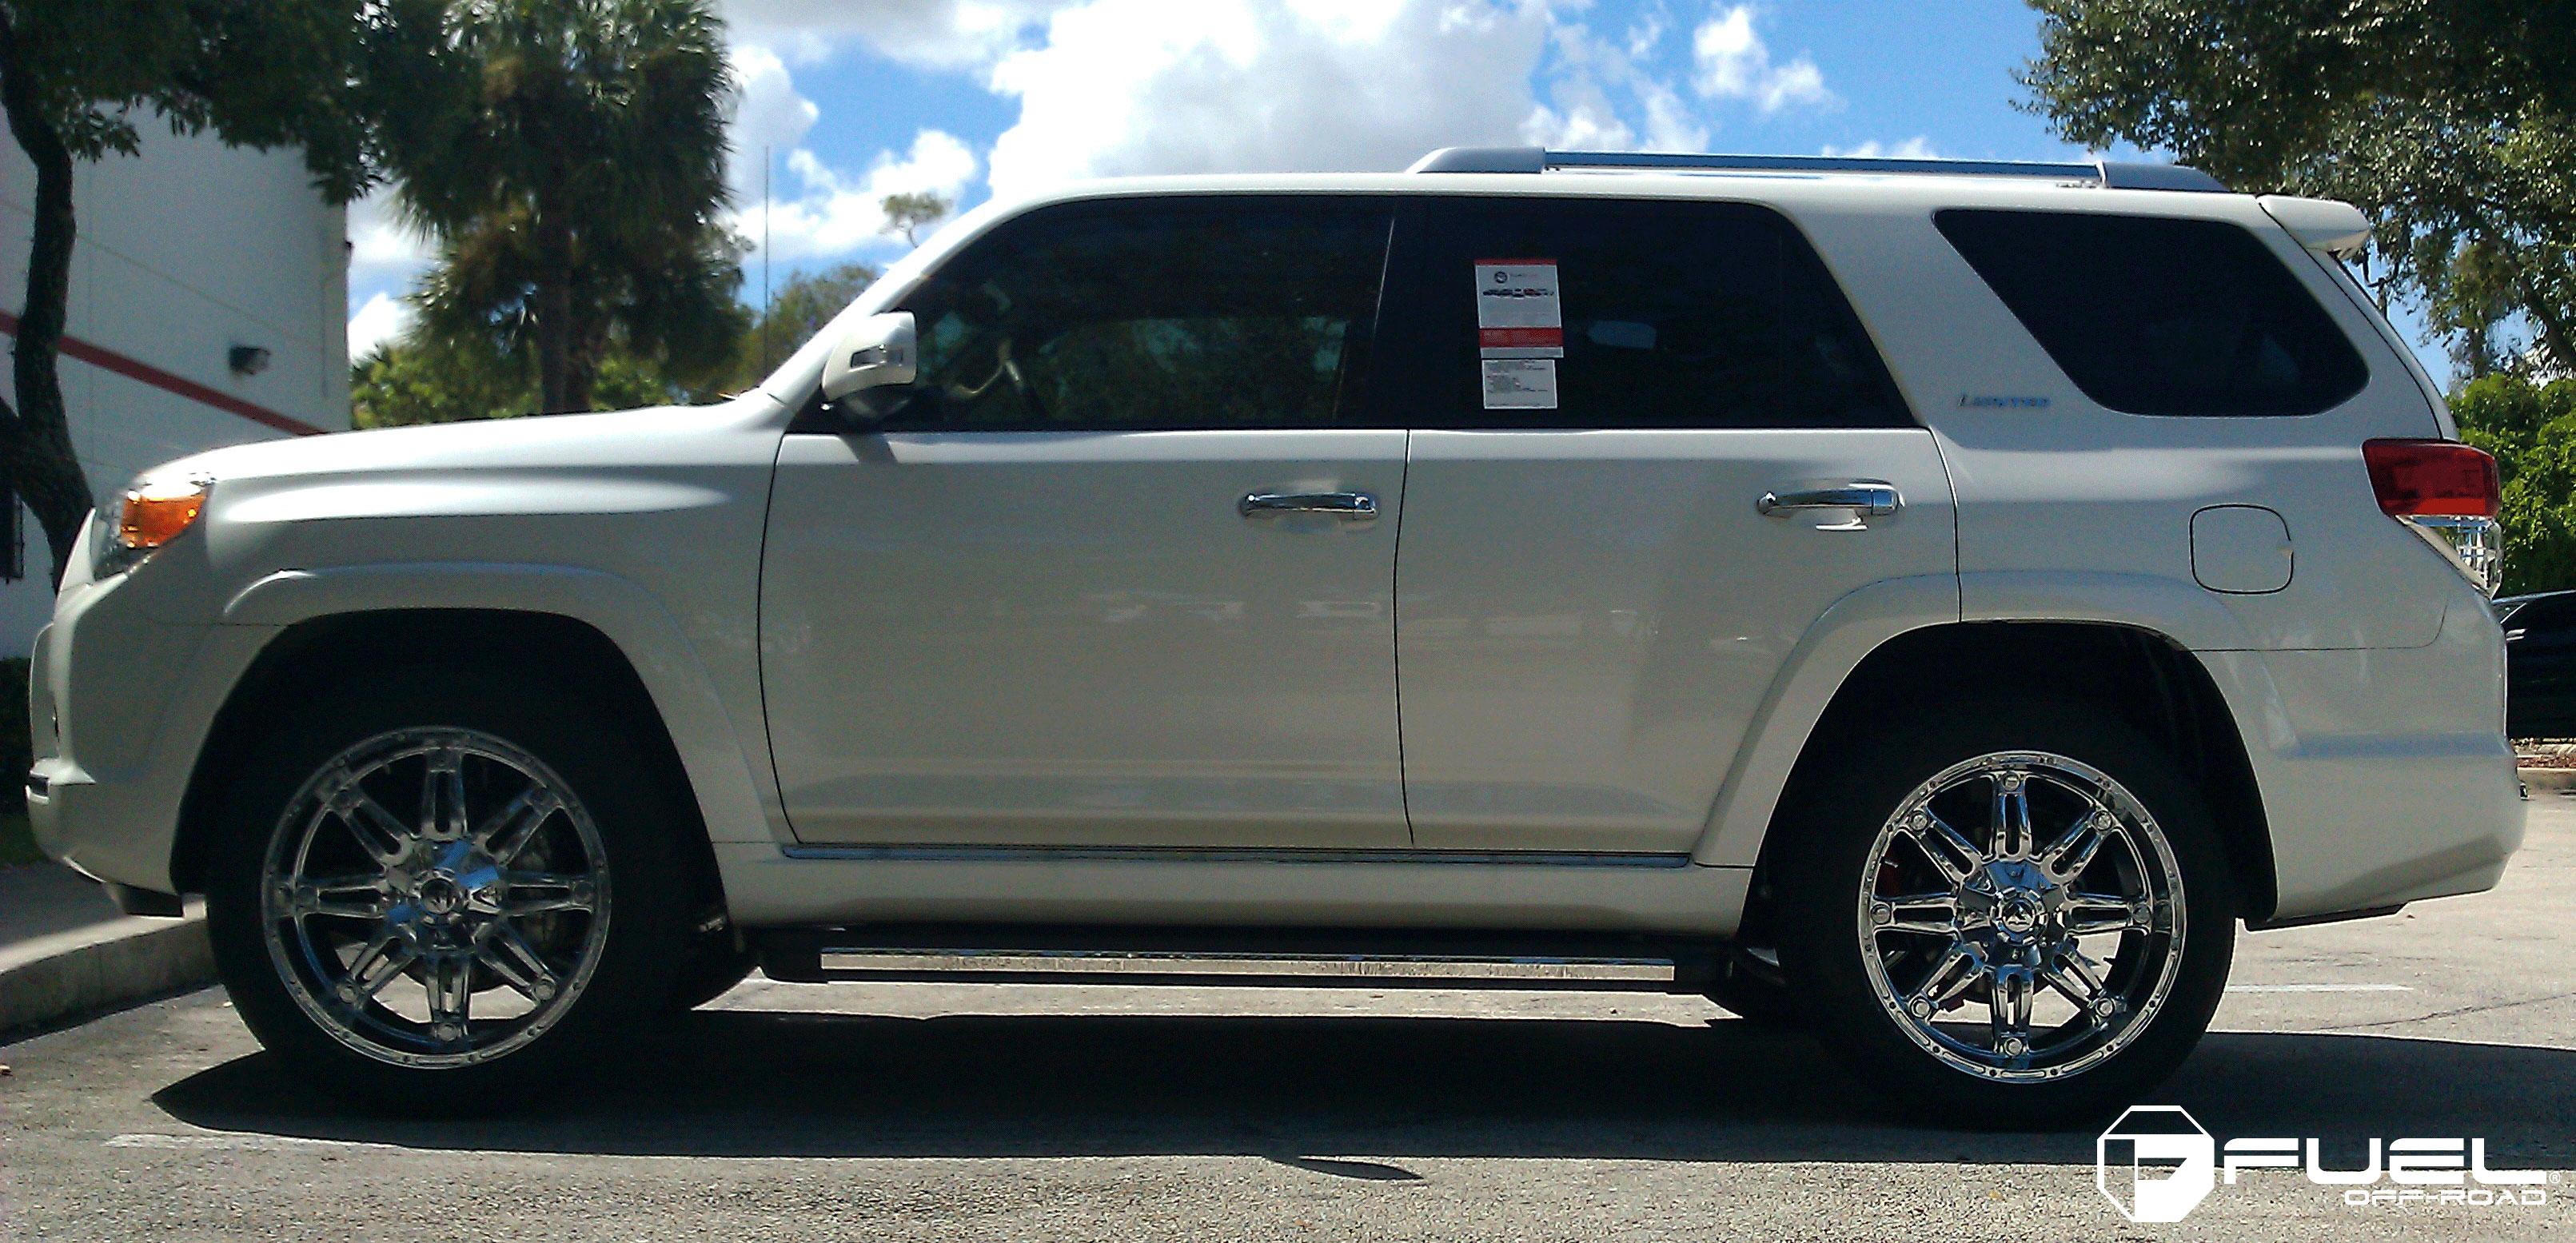 Toyota 4runner Hostage D530 Gallery Mht Wheels Inc